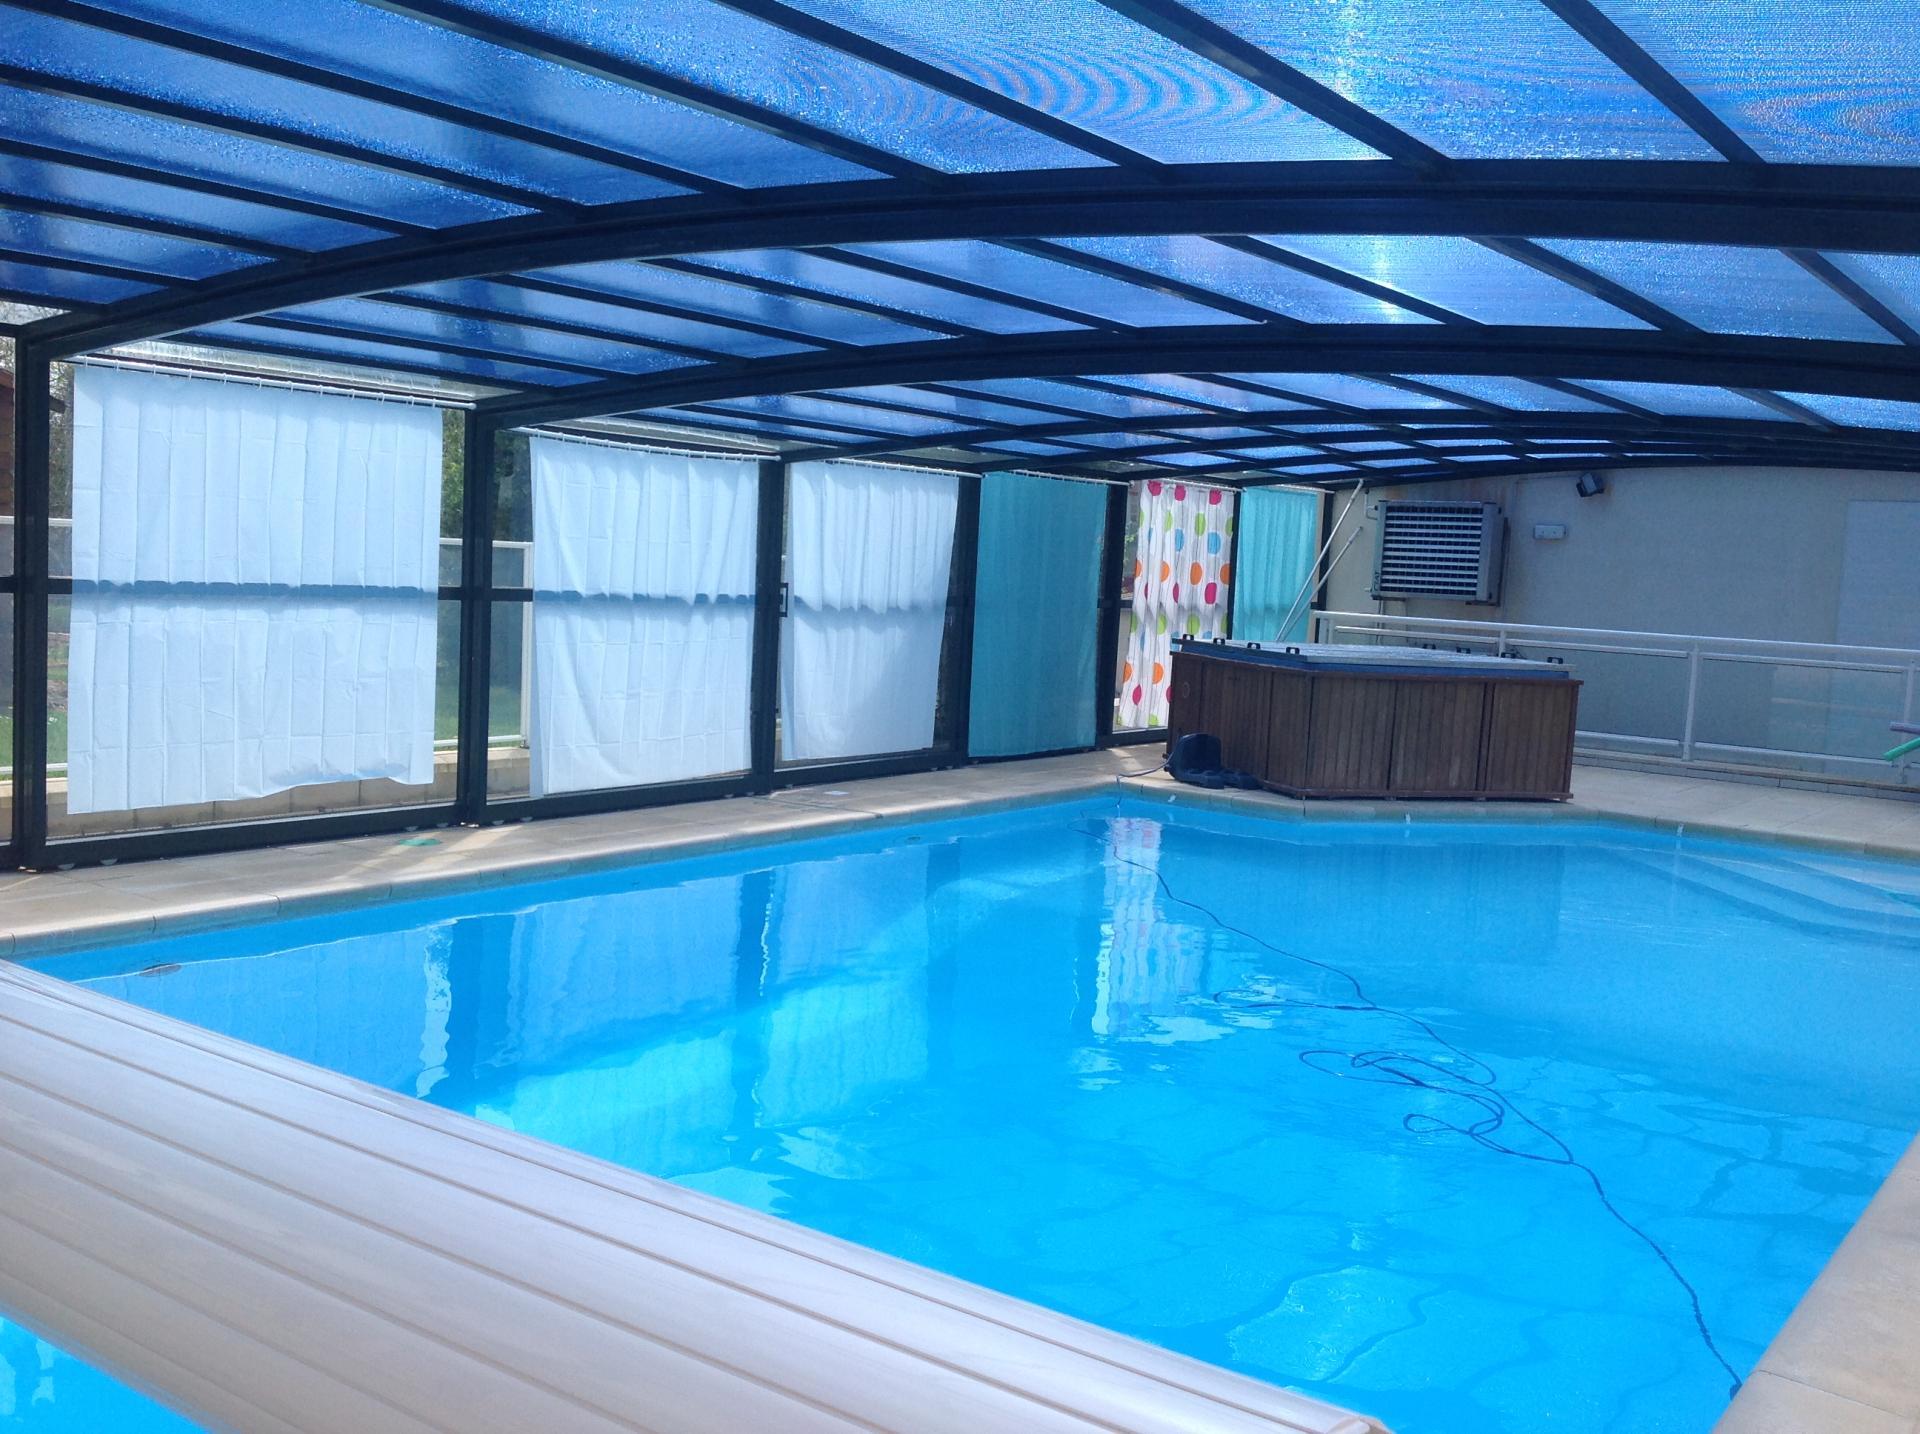 gite avec une piscine chauff e qui pr serve l 39 intimit. Black Bedroom Furniture Sets. Home Design Ideas